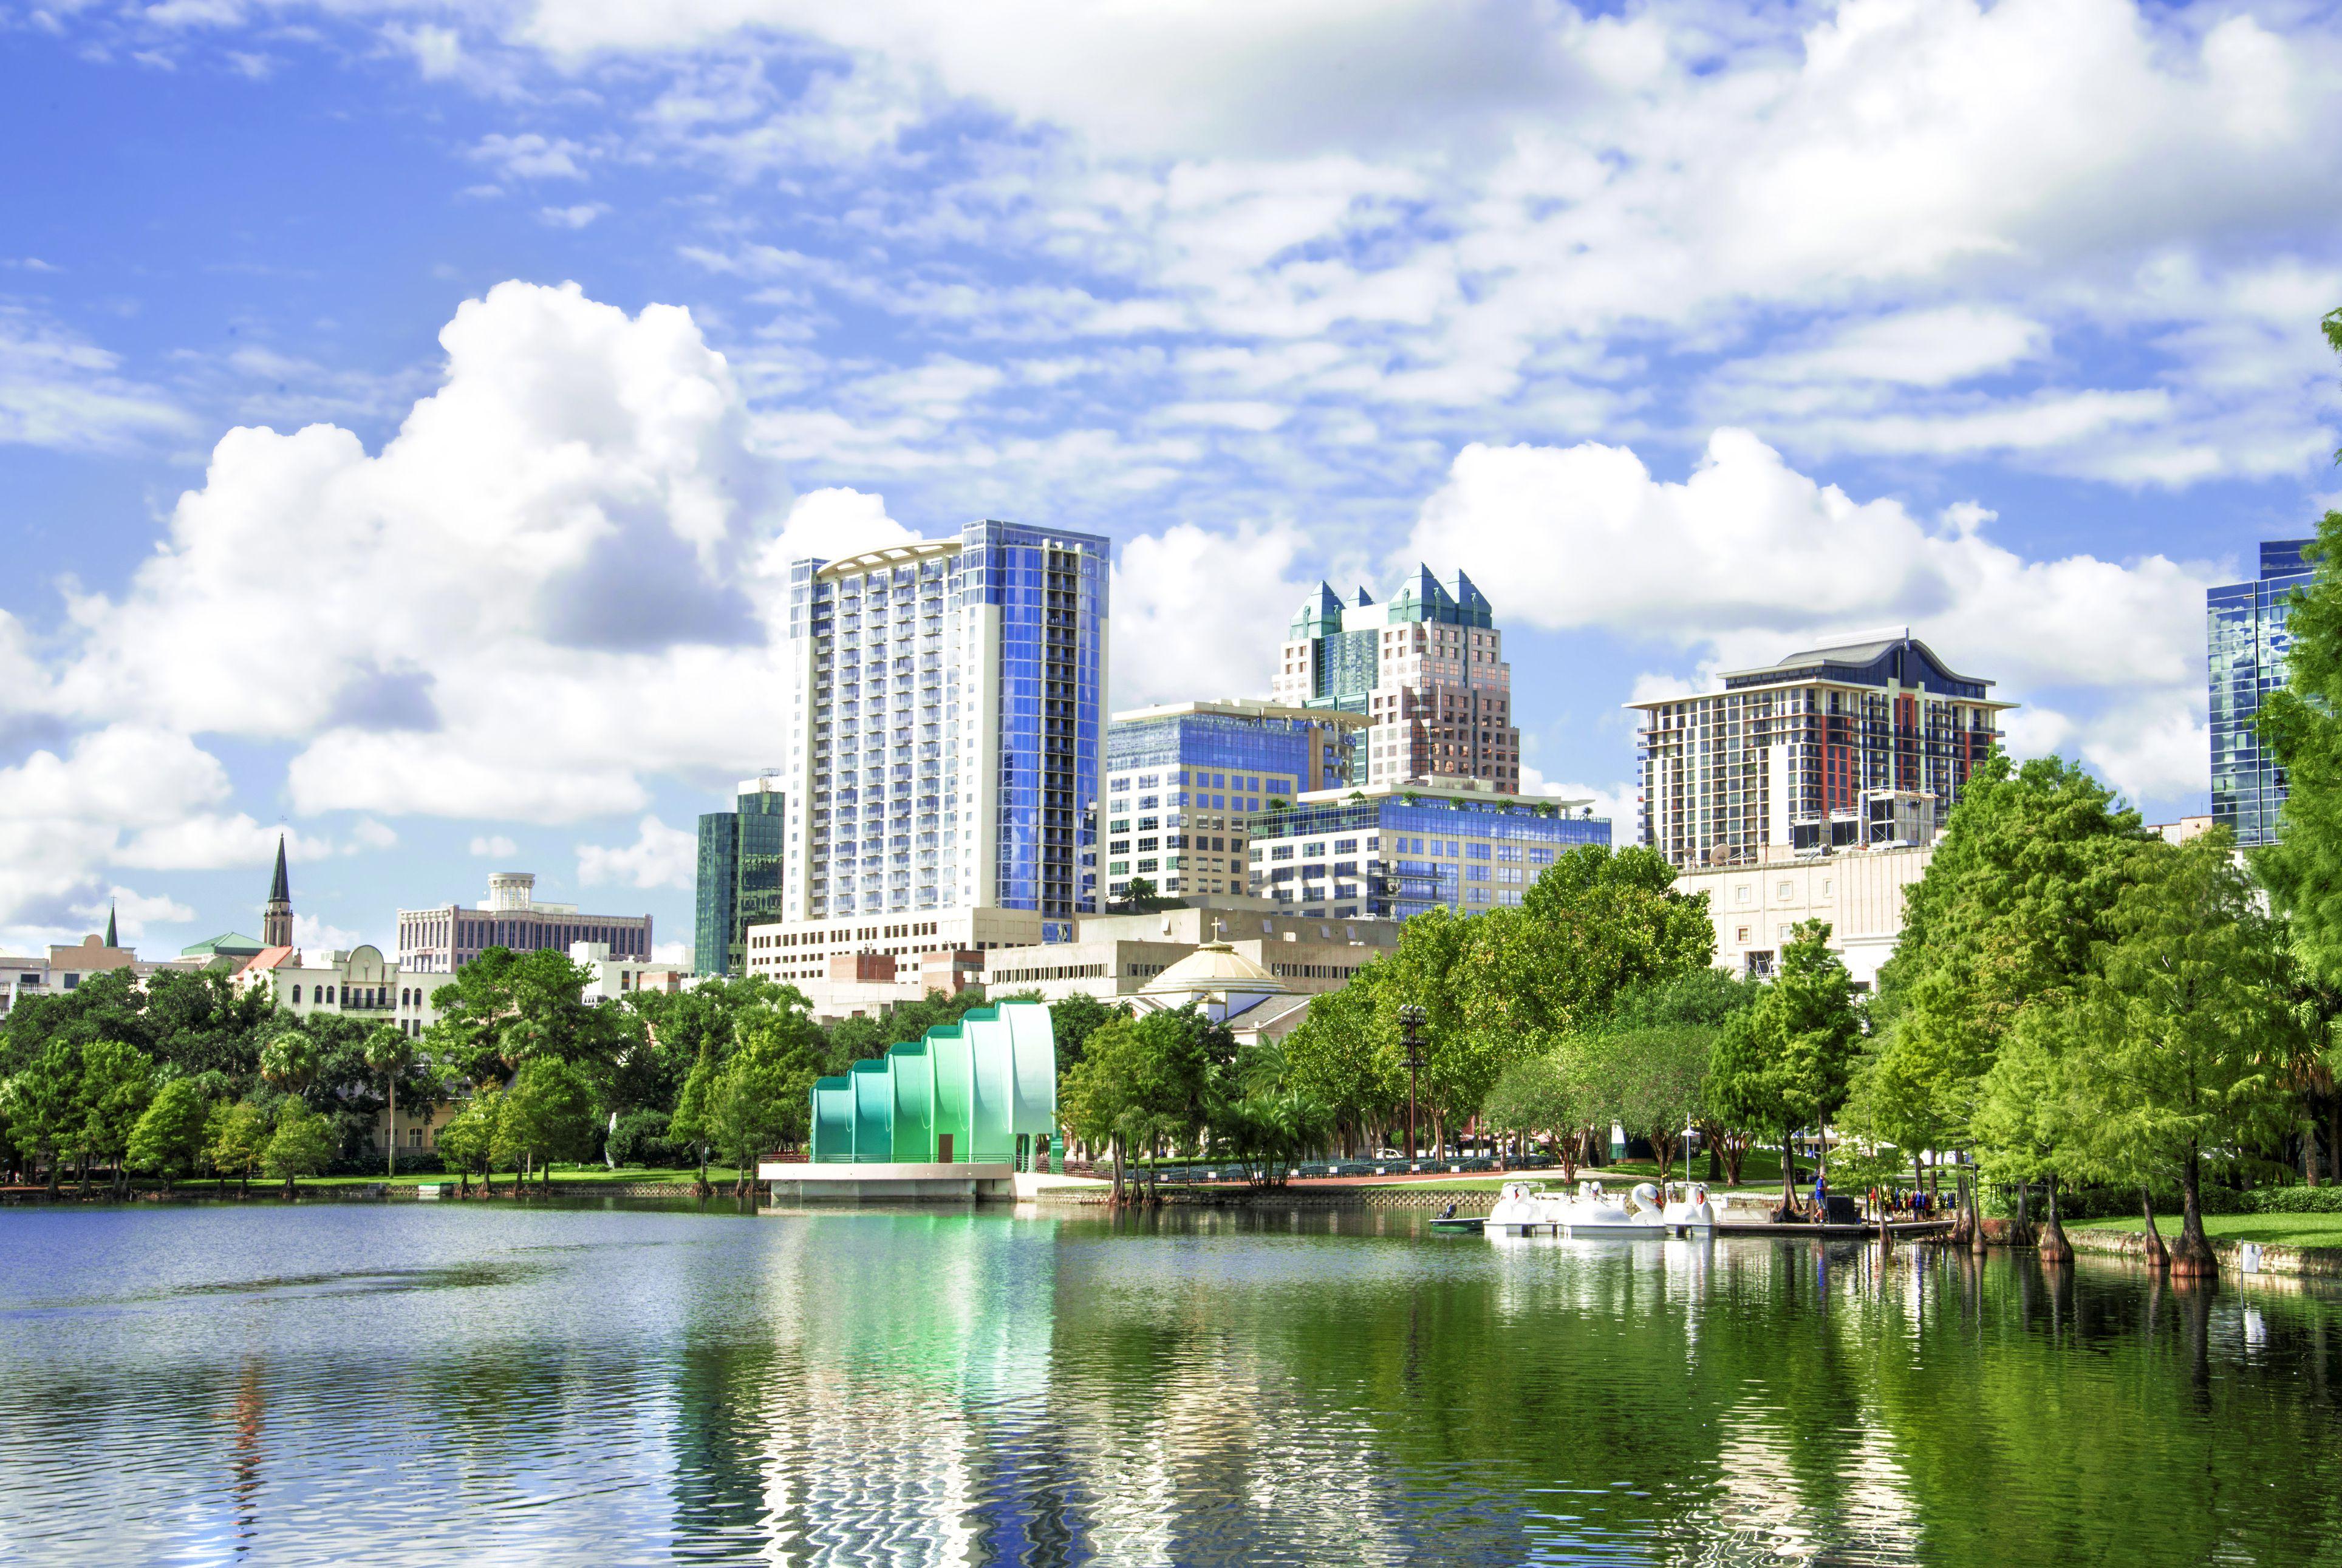 Lake Eola sehen in Orlando Florida